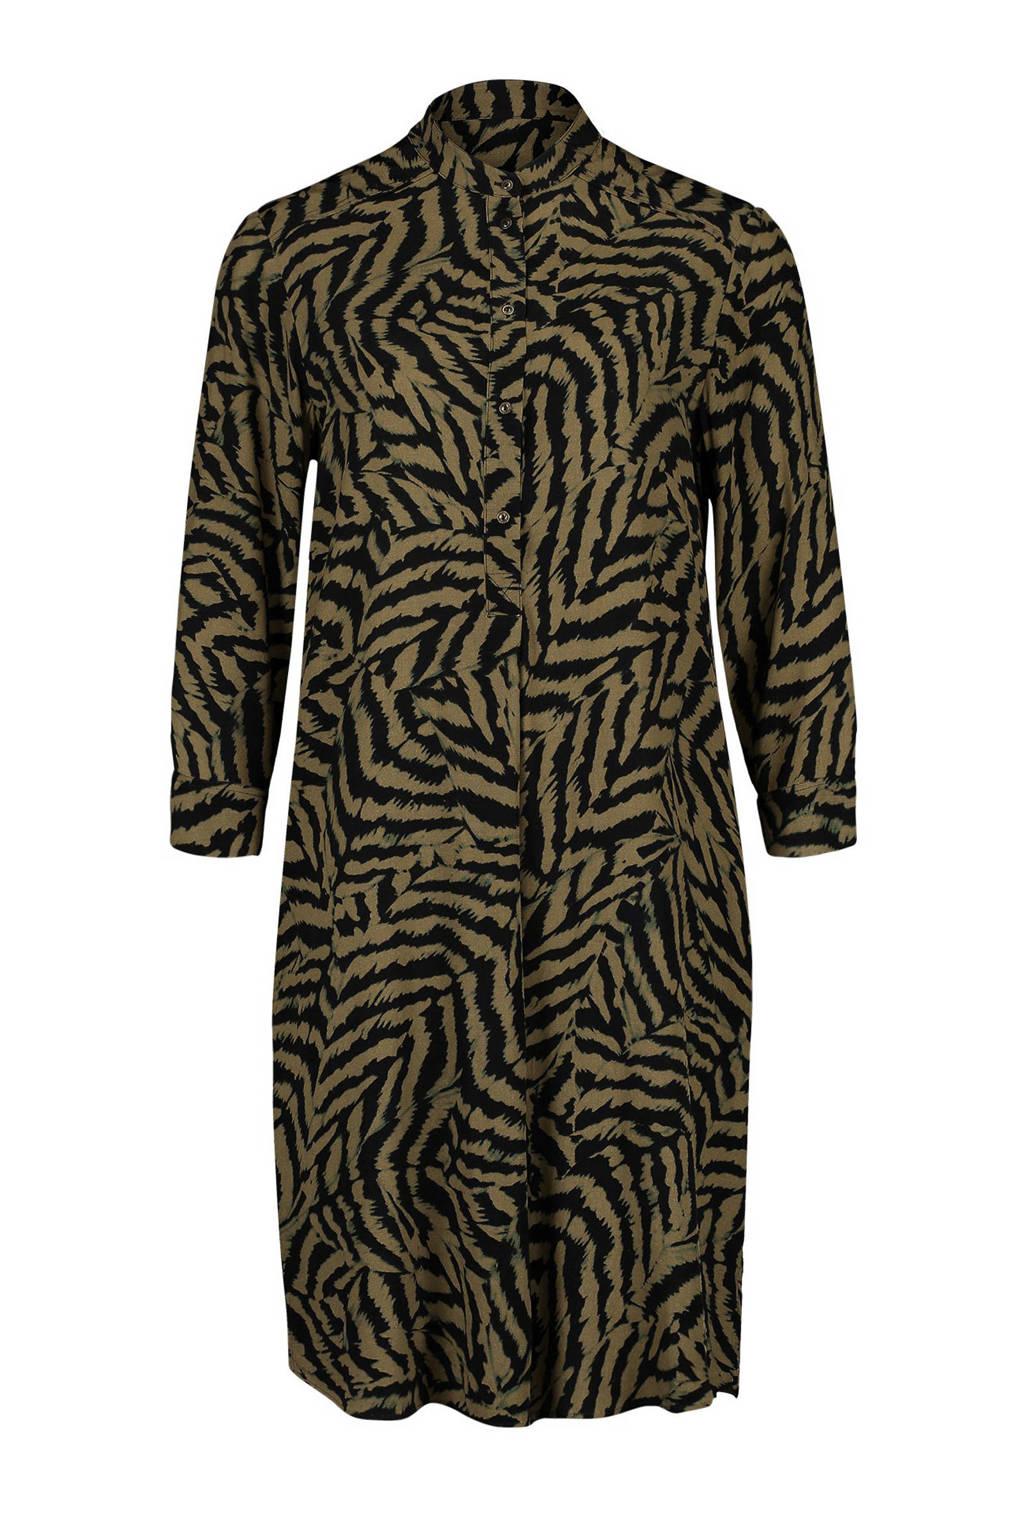 Expresso blousejurk met tijgerprint kaki, Kaki